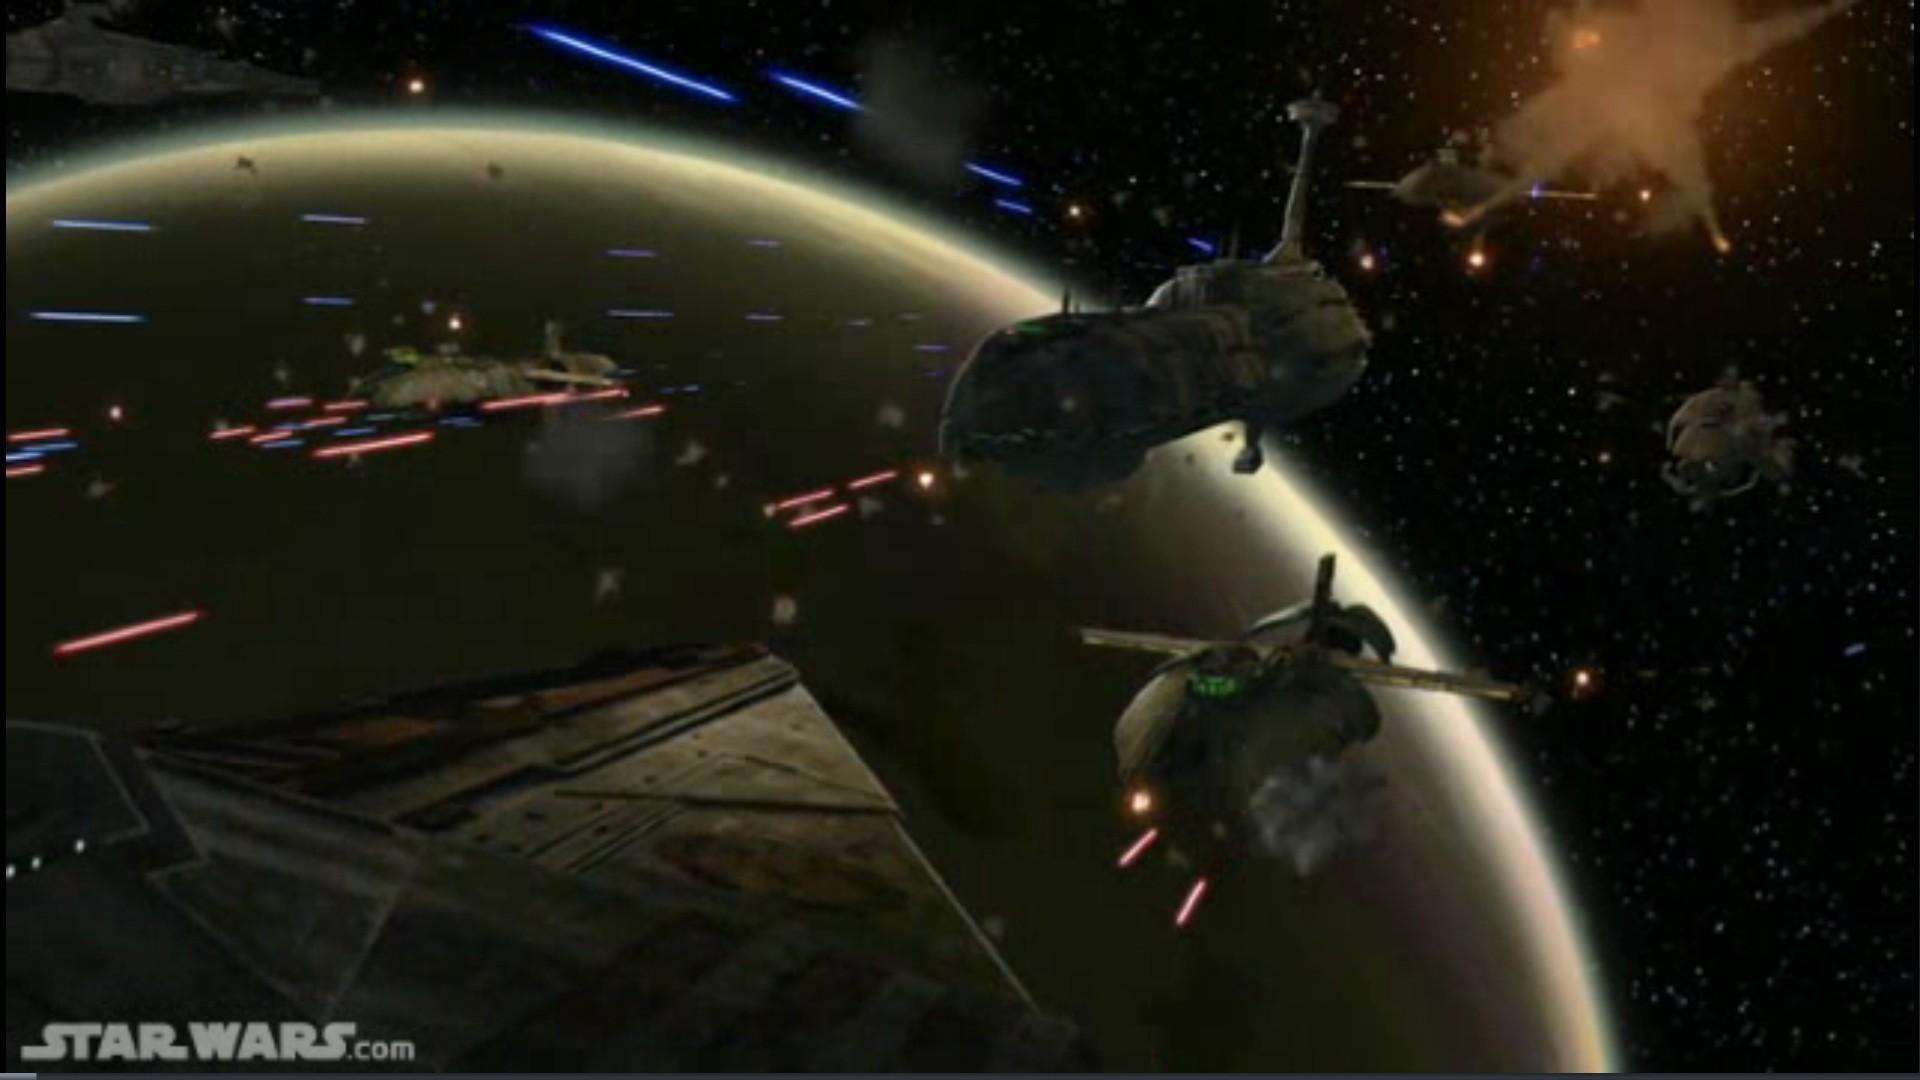 Report RSS TCW Season 3 Space Battle Image (view original)